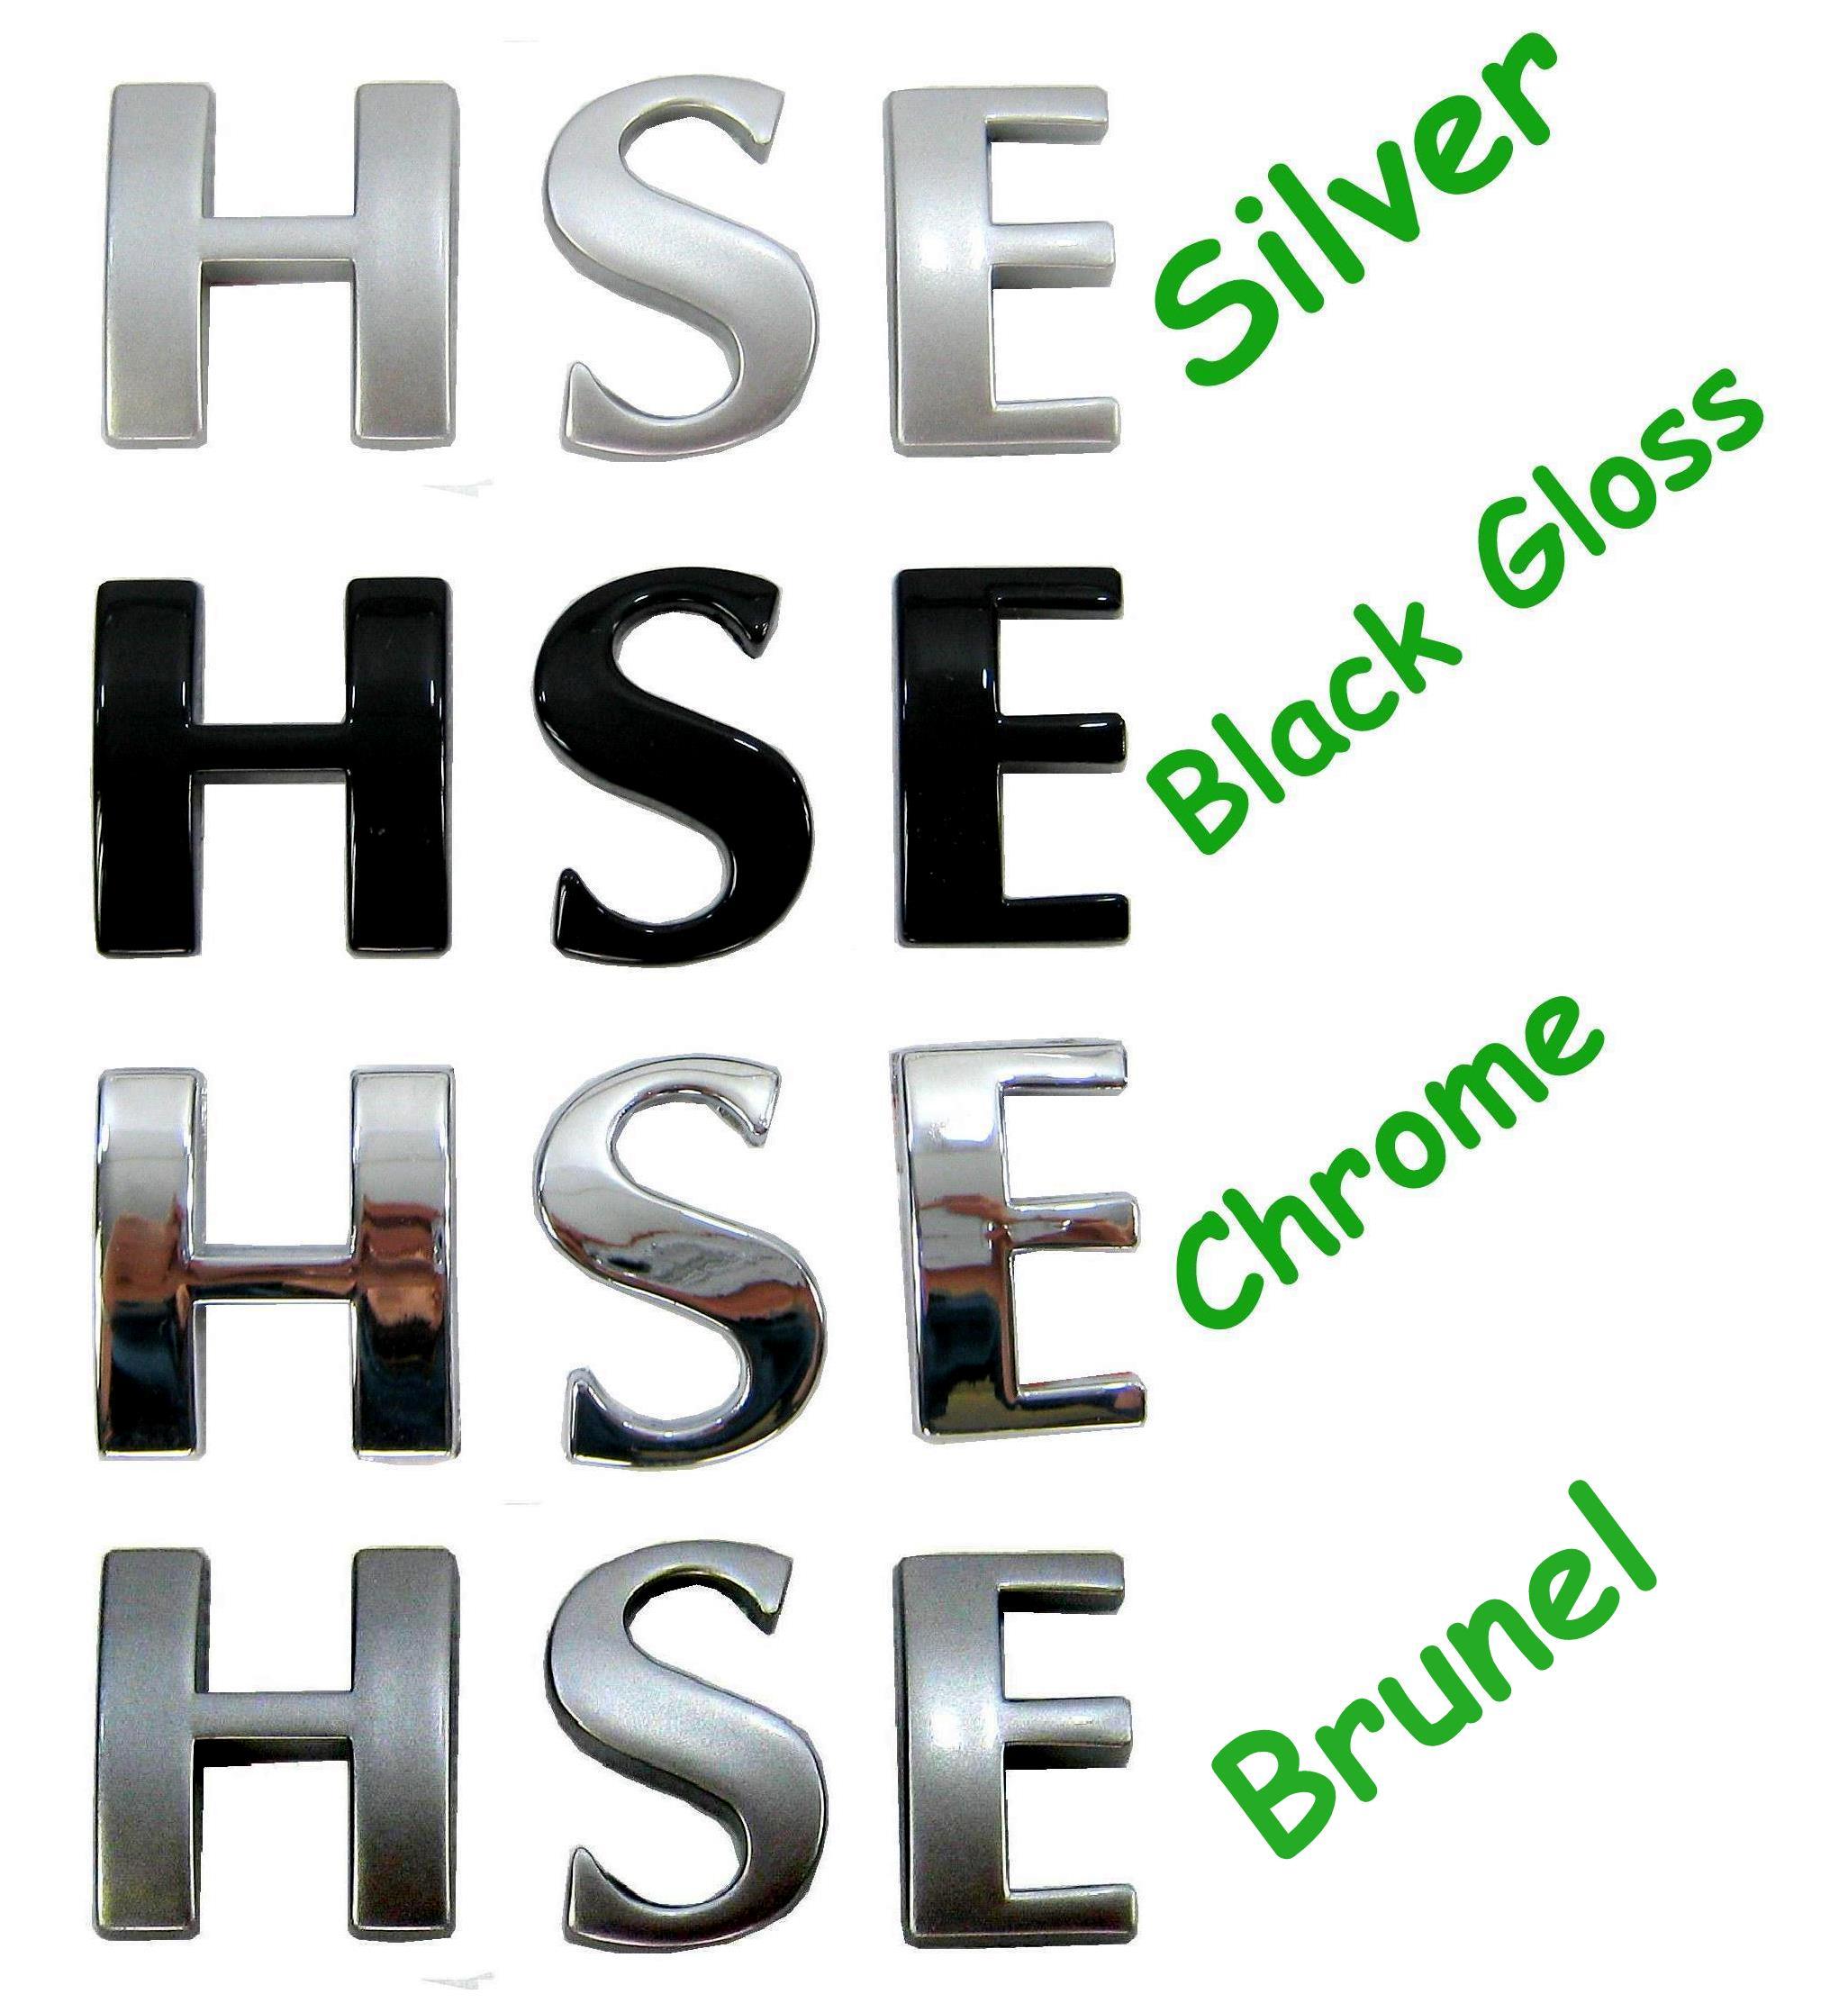 Gray Alphabet Font: Brunel Grey Letters HSE Logo For Range Rover L322 Diesel